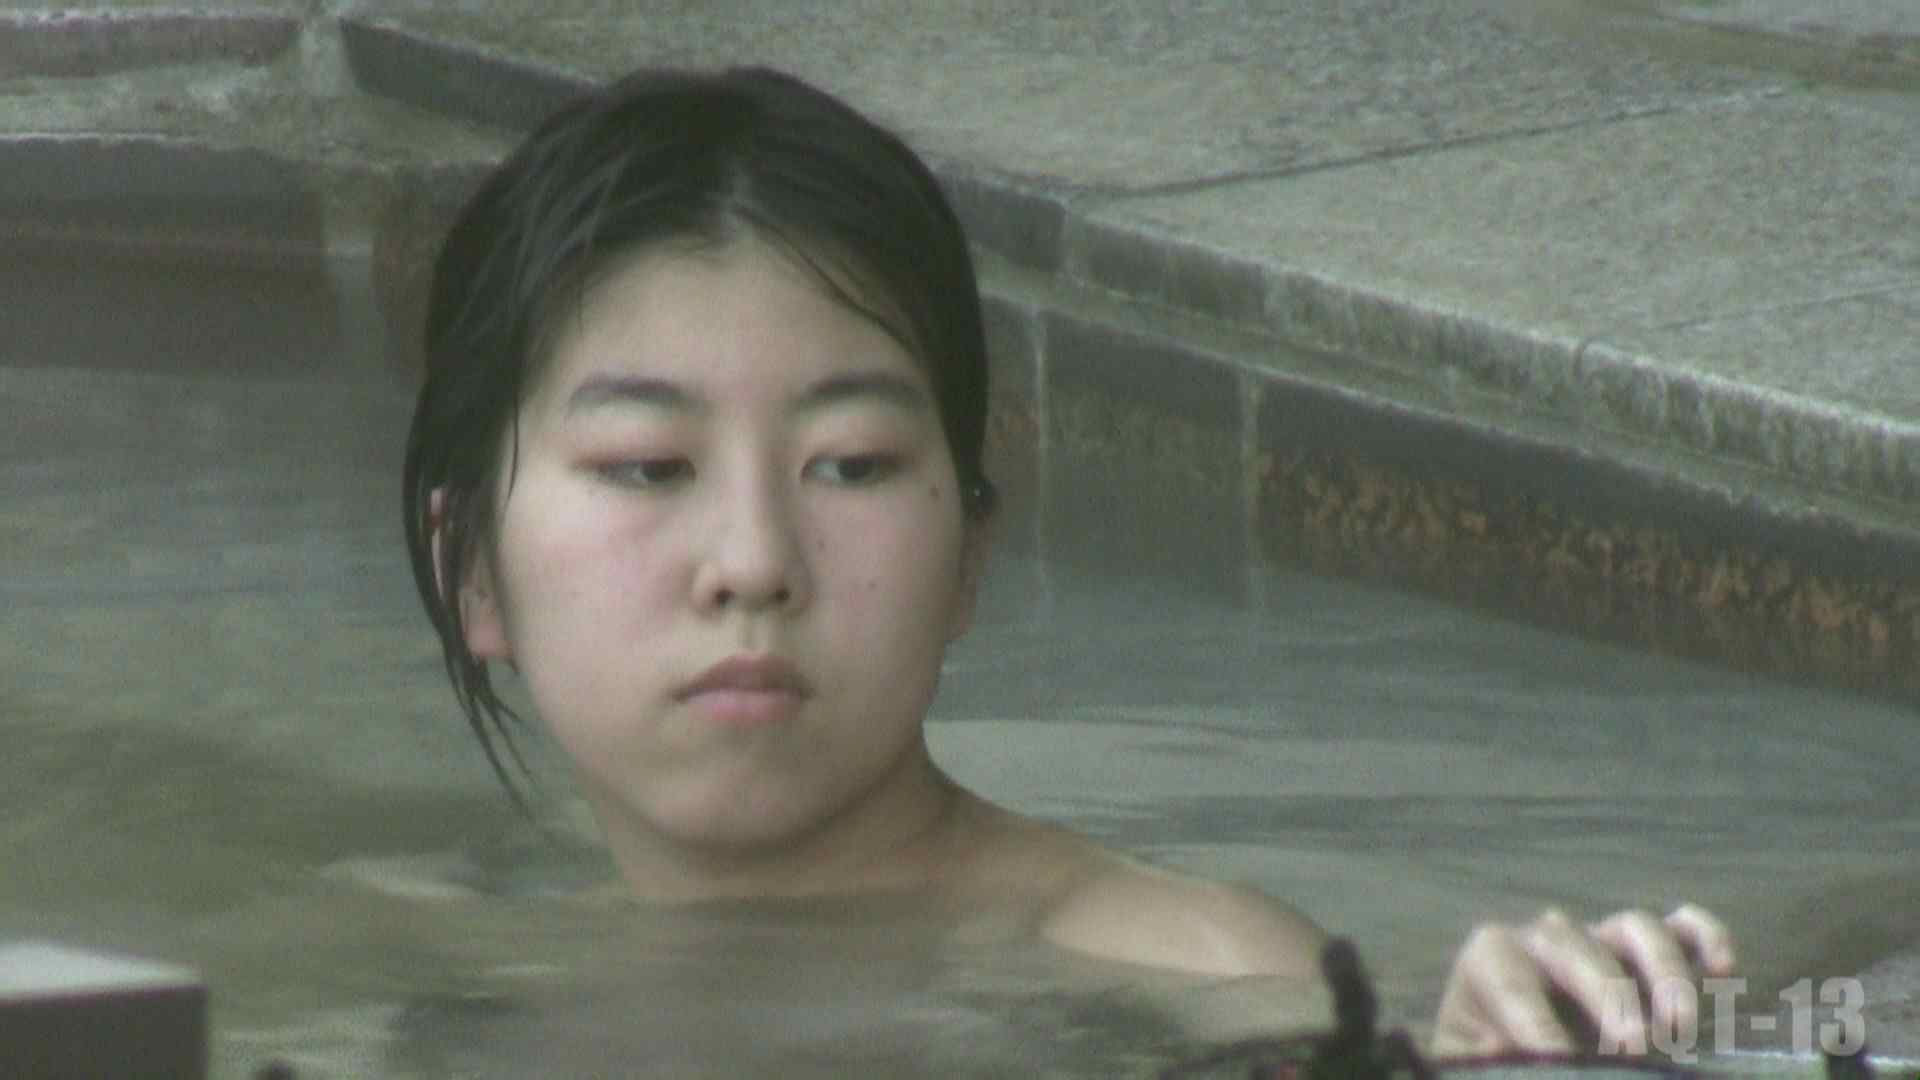 Aquaな露天風呂Vol.816 盗撮   OLエロ画像  105PICs 4